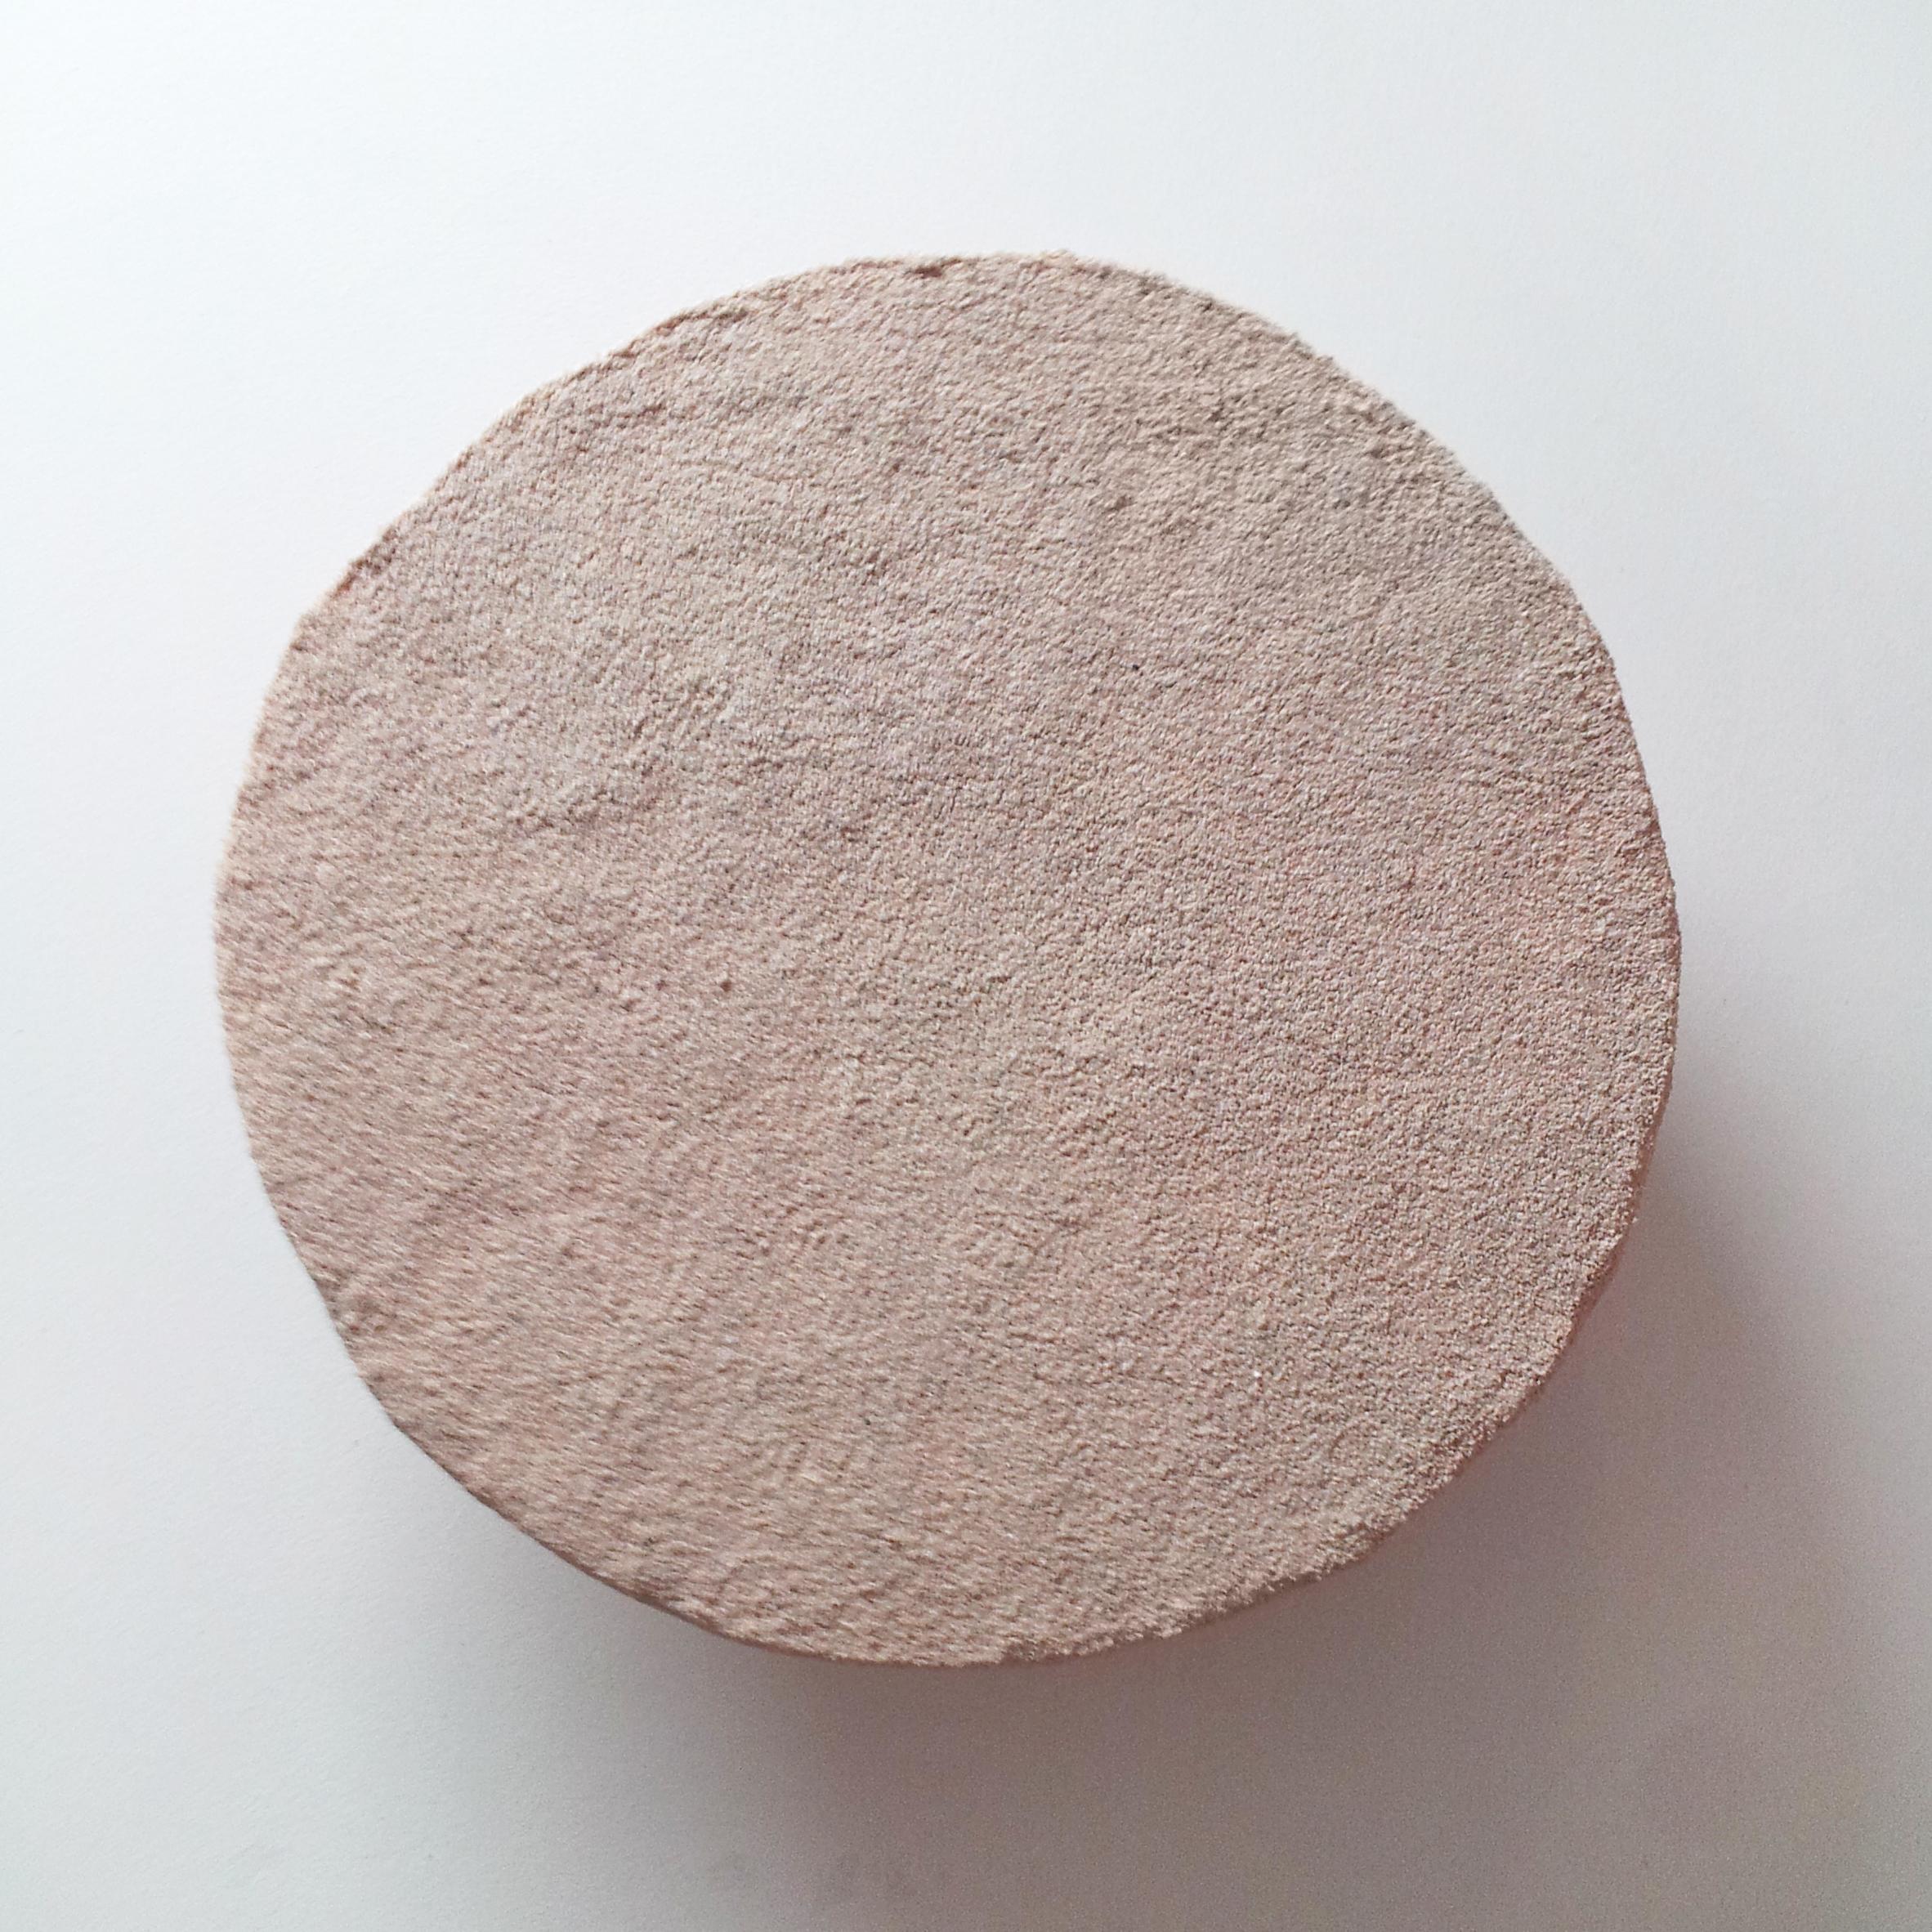 "Rachel Higgins, "" Clock,"" 2014,Polystyrene, cerastone, wood, hardware, 1RPM motor, AA batteries,13x13x3 in"